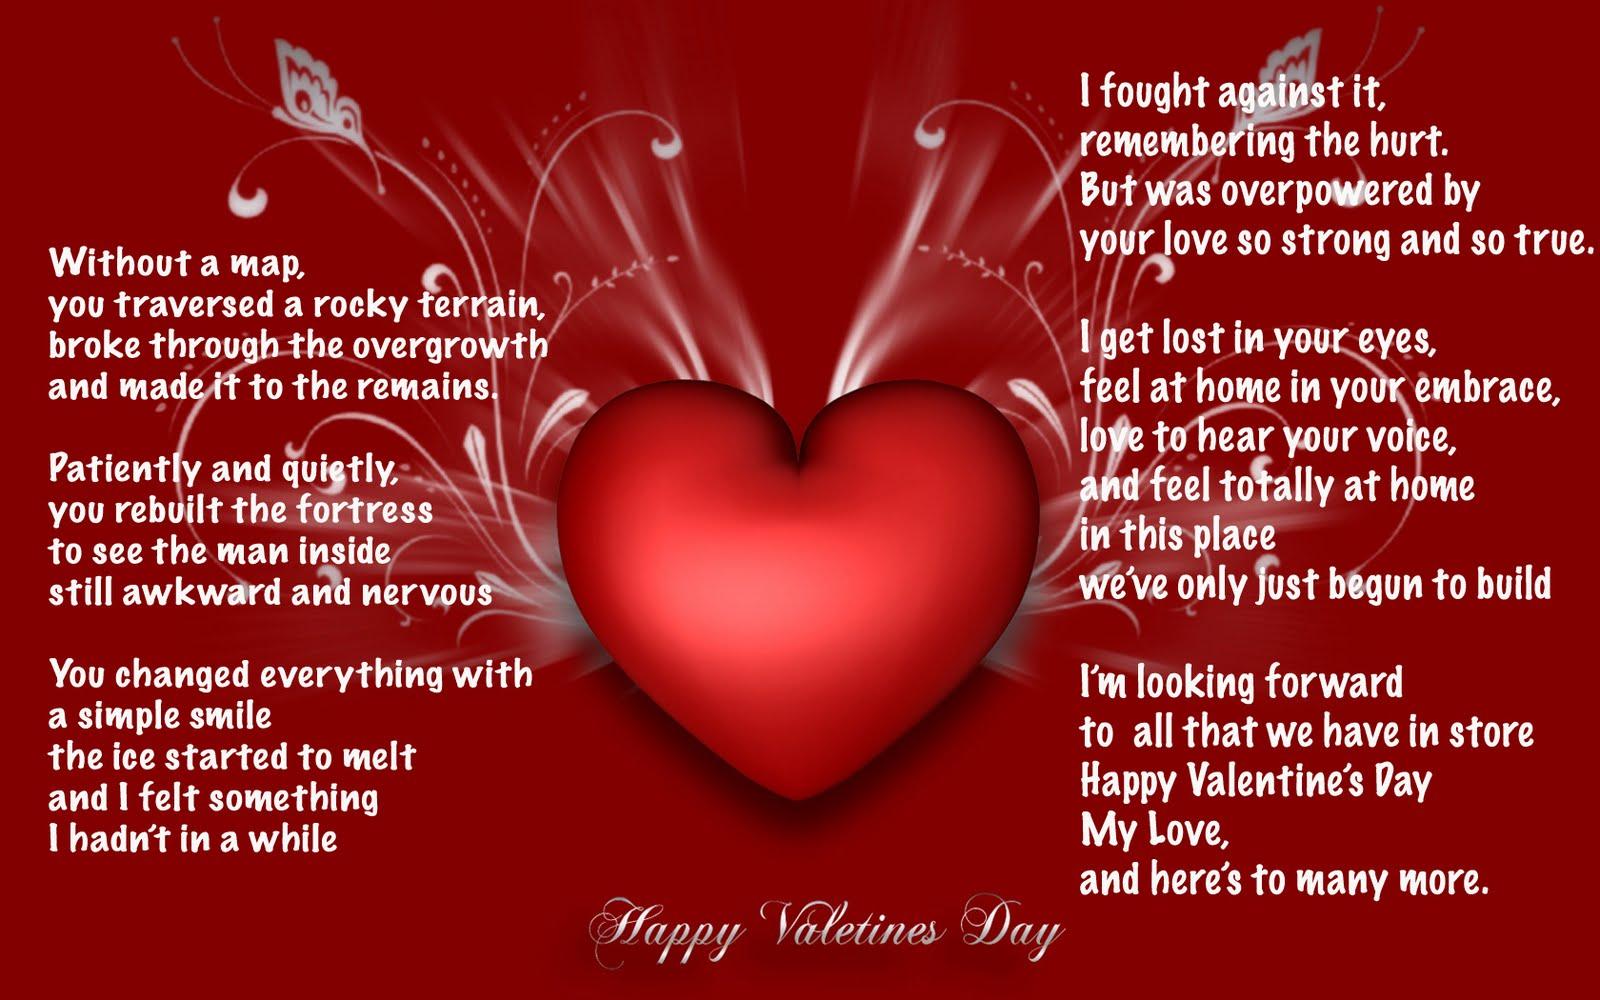 Valentine's Day quote #4